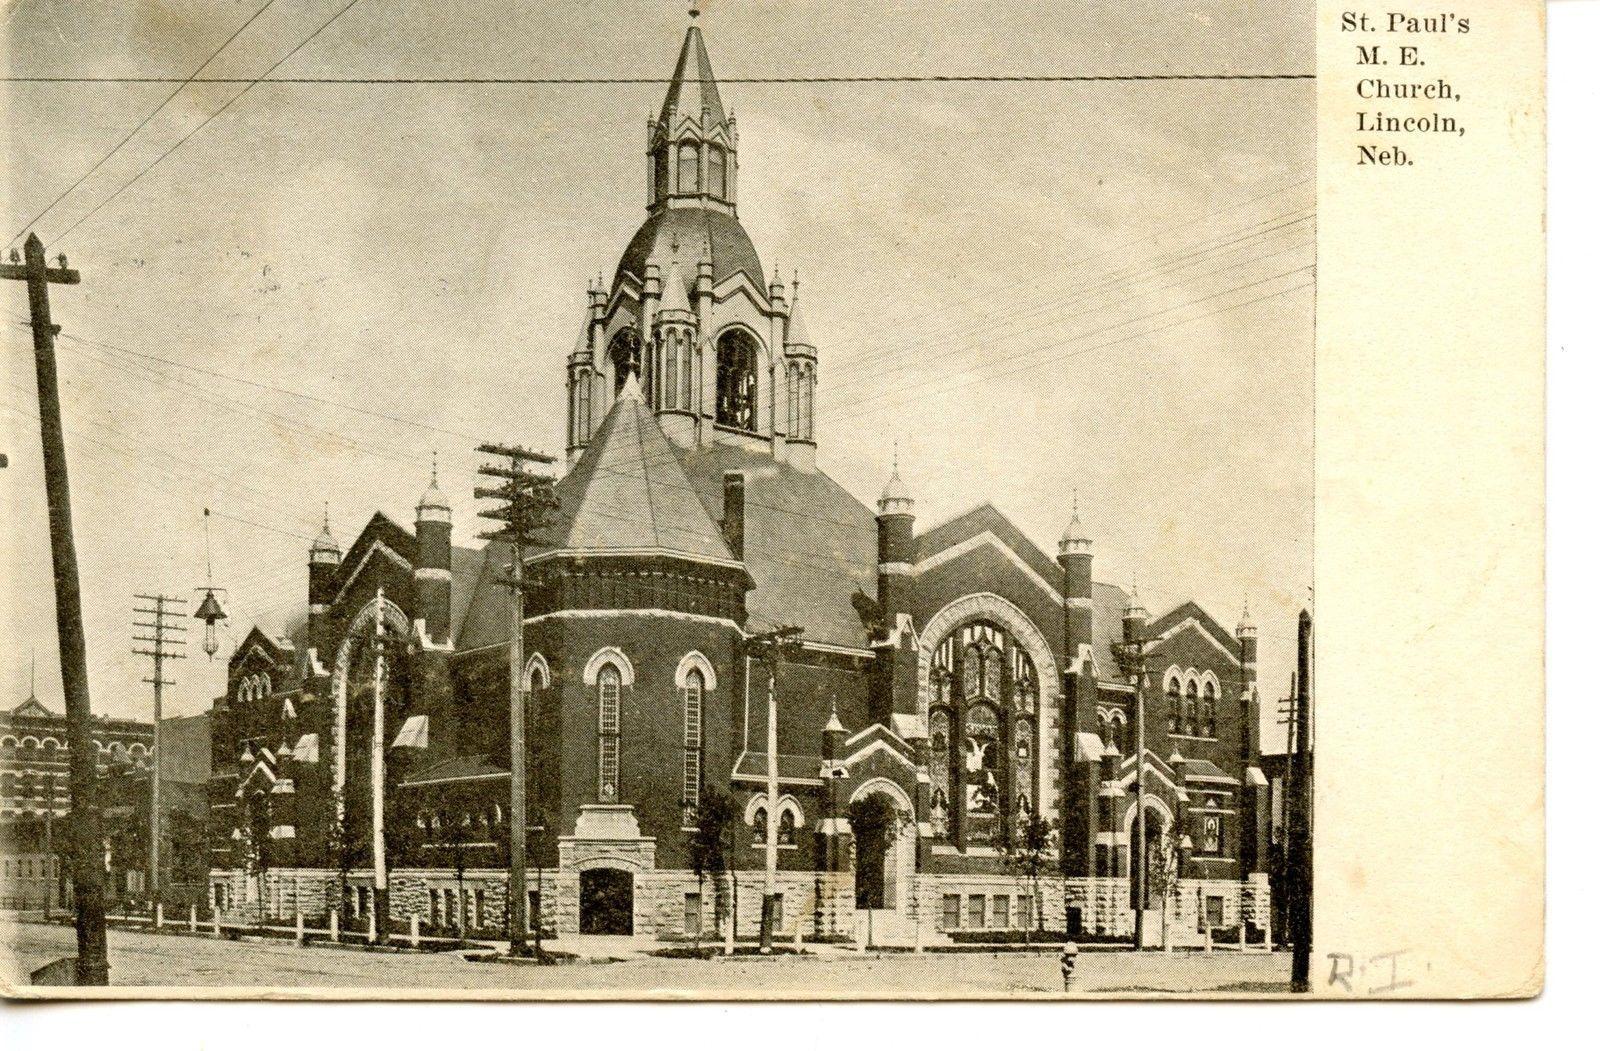 St Saint Paul's Methodist Church BuildingLincolnNebraska